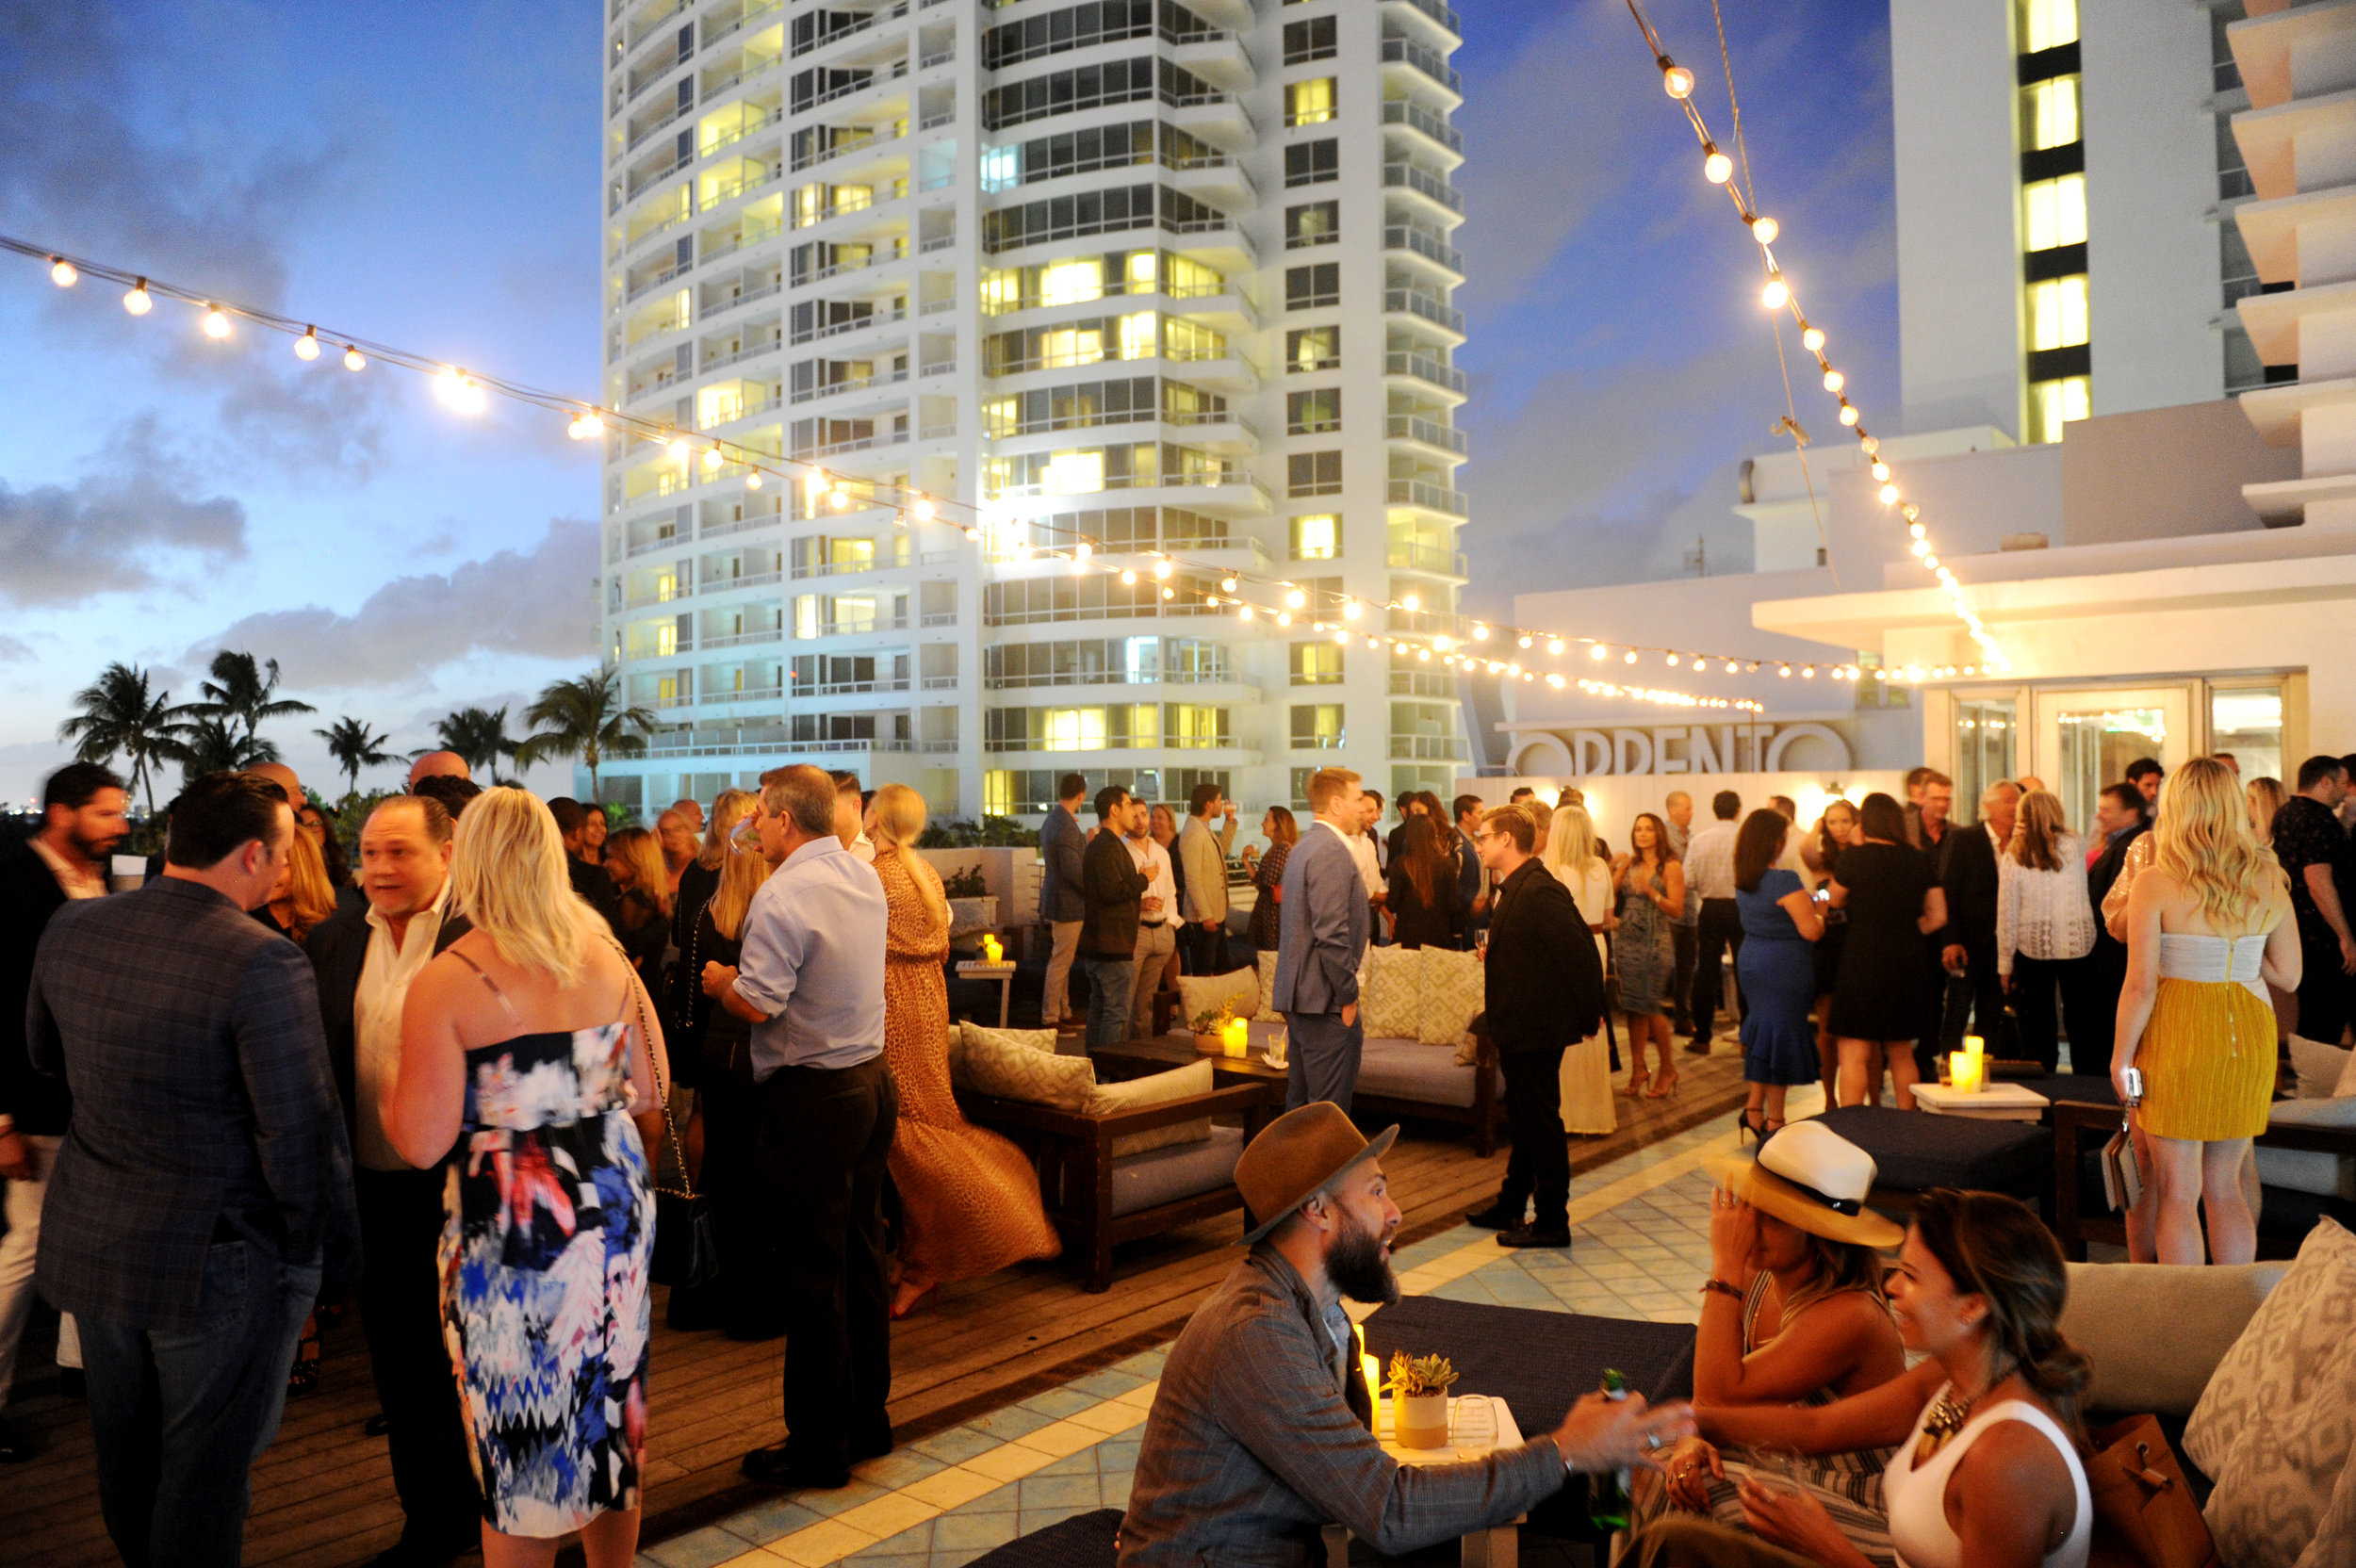 Bravo's Million Dollar Listing Star Fredrik Eklund & John Gomes Launch Miami Team With Douglas Elliman